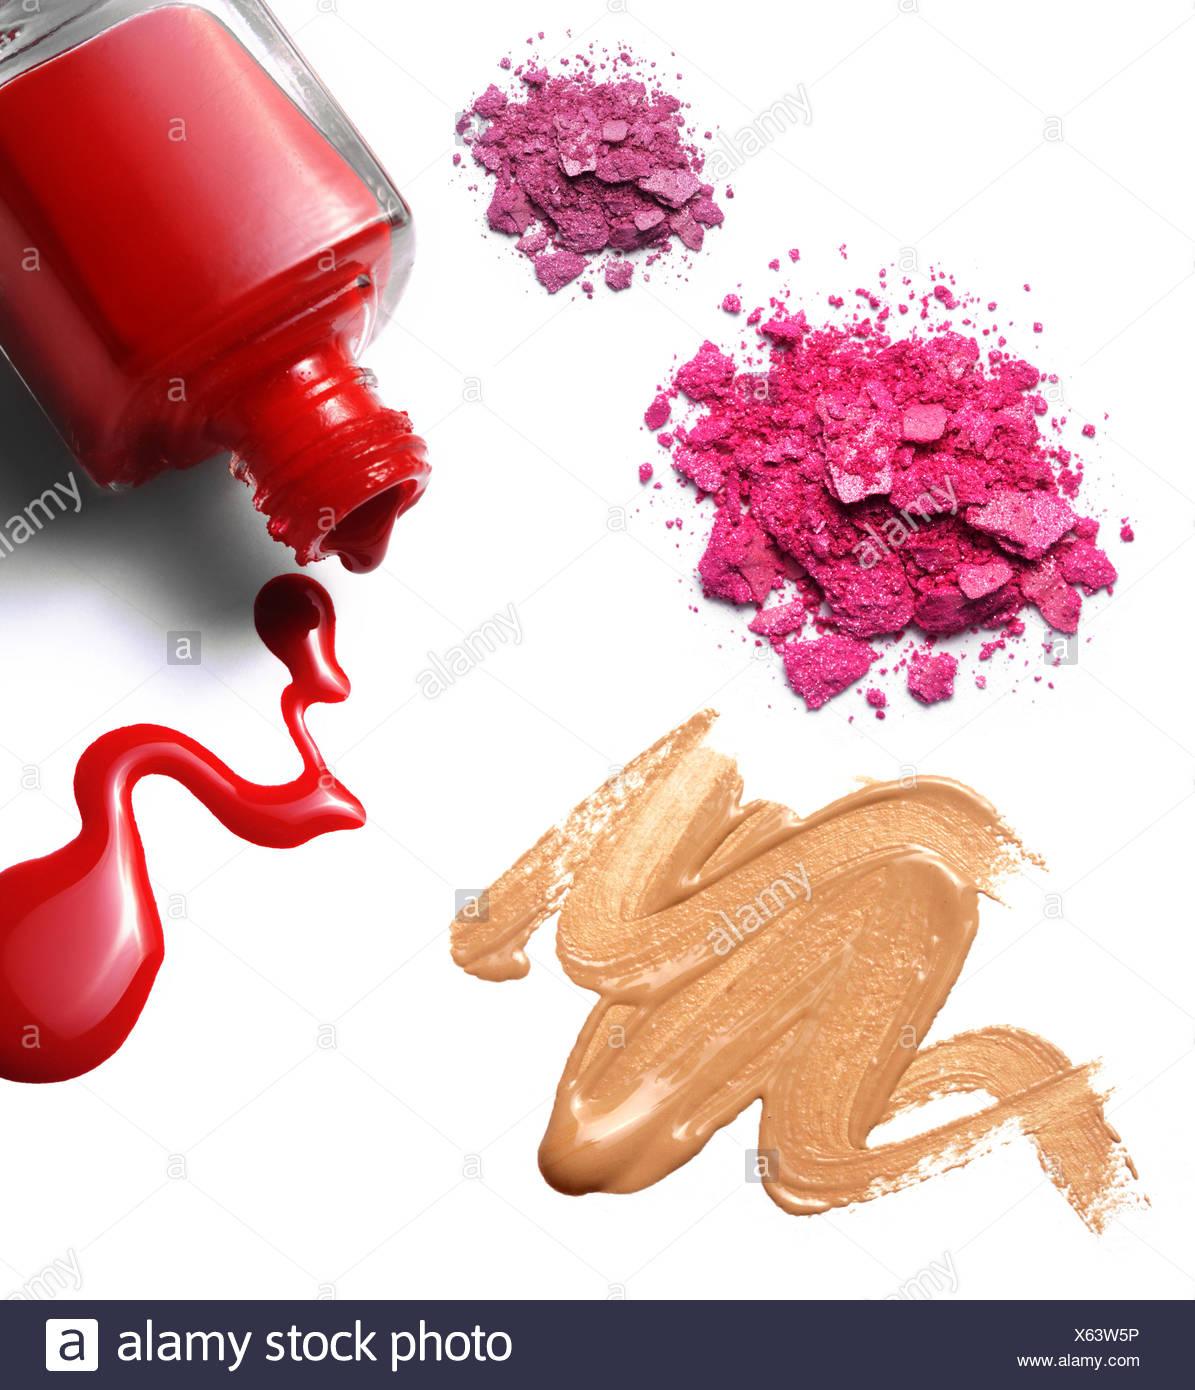 make up,eyeshadow,nail polish,cosmetics Stock Photo: 279139442 - Alamy